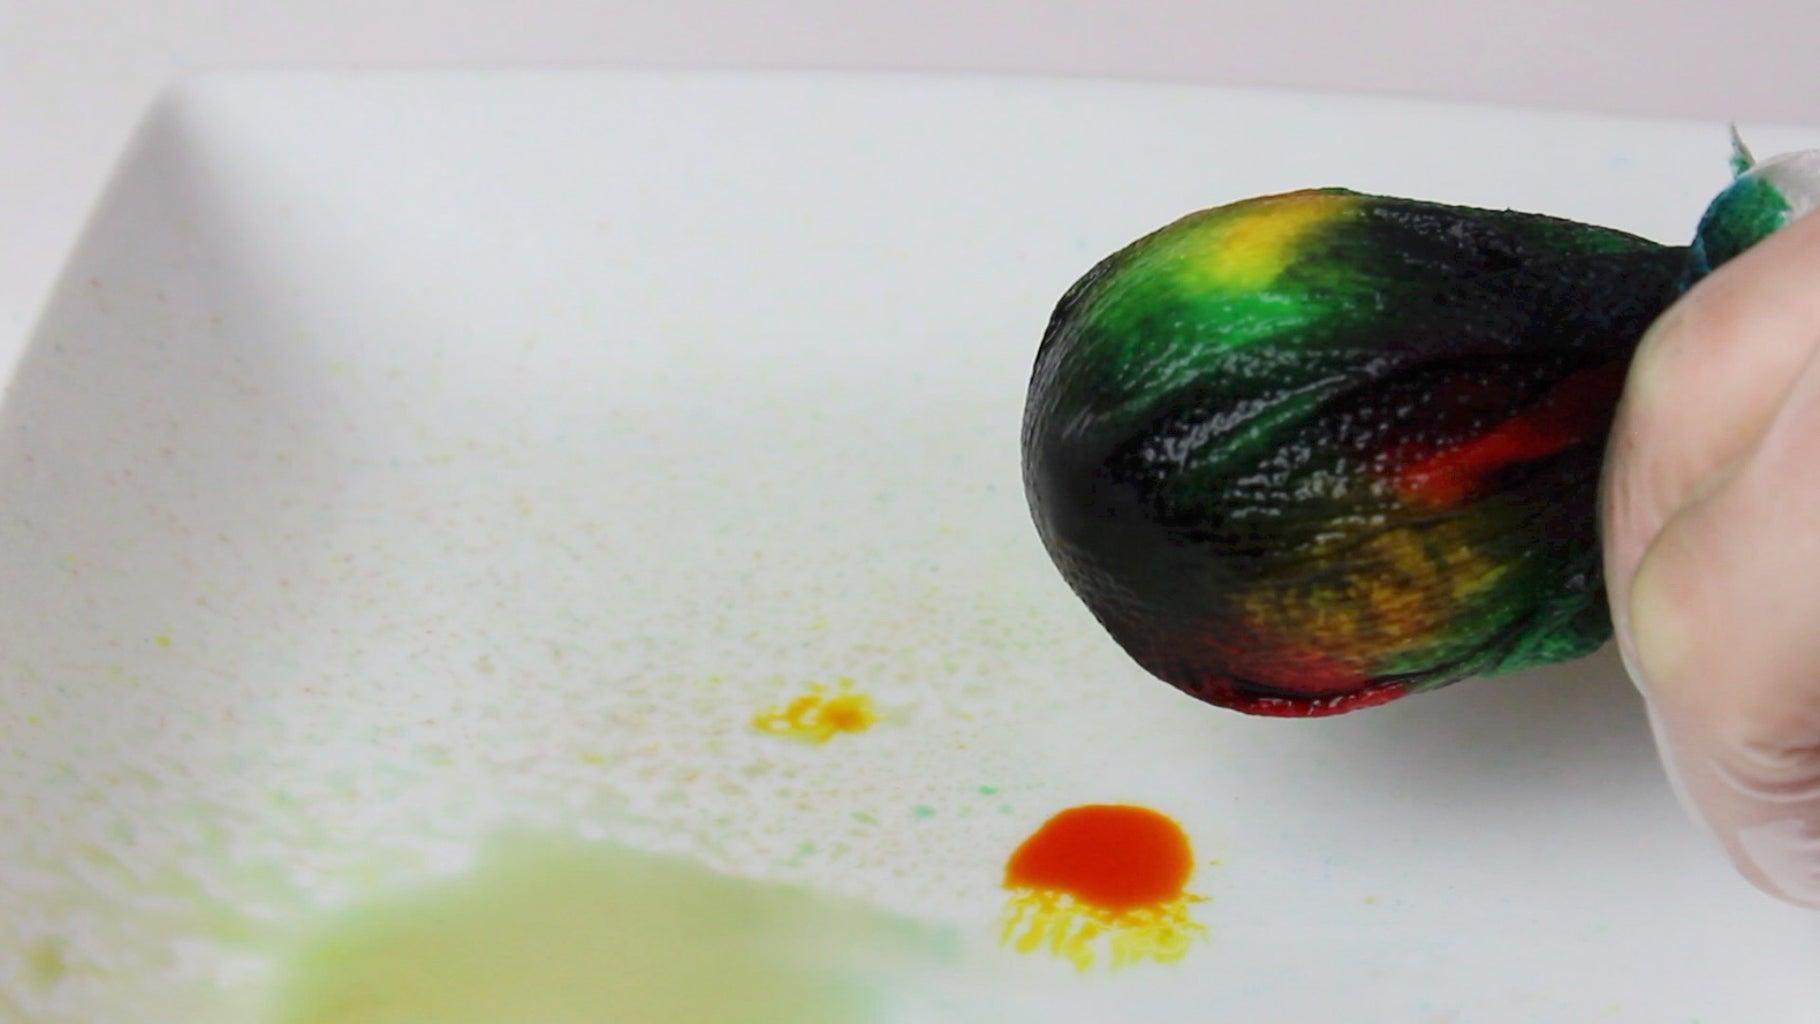 Spray the Egg